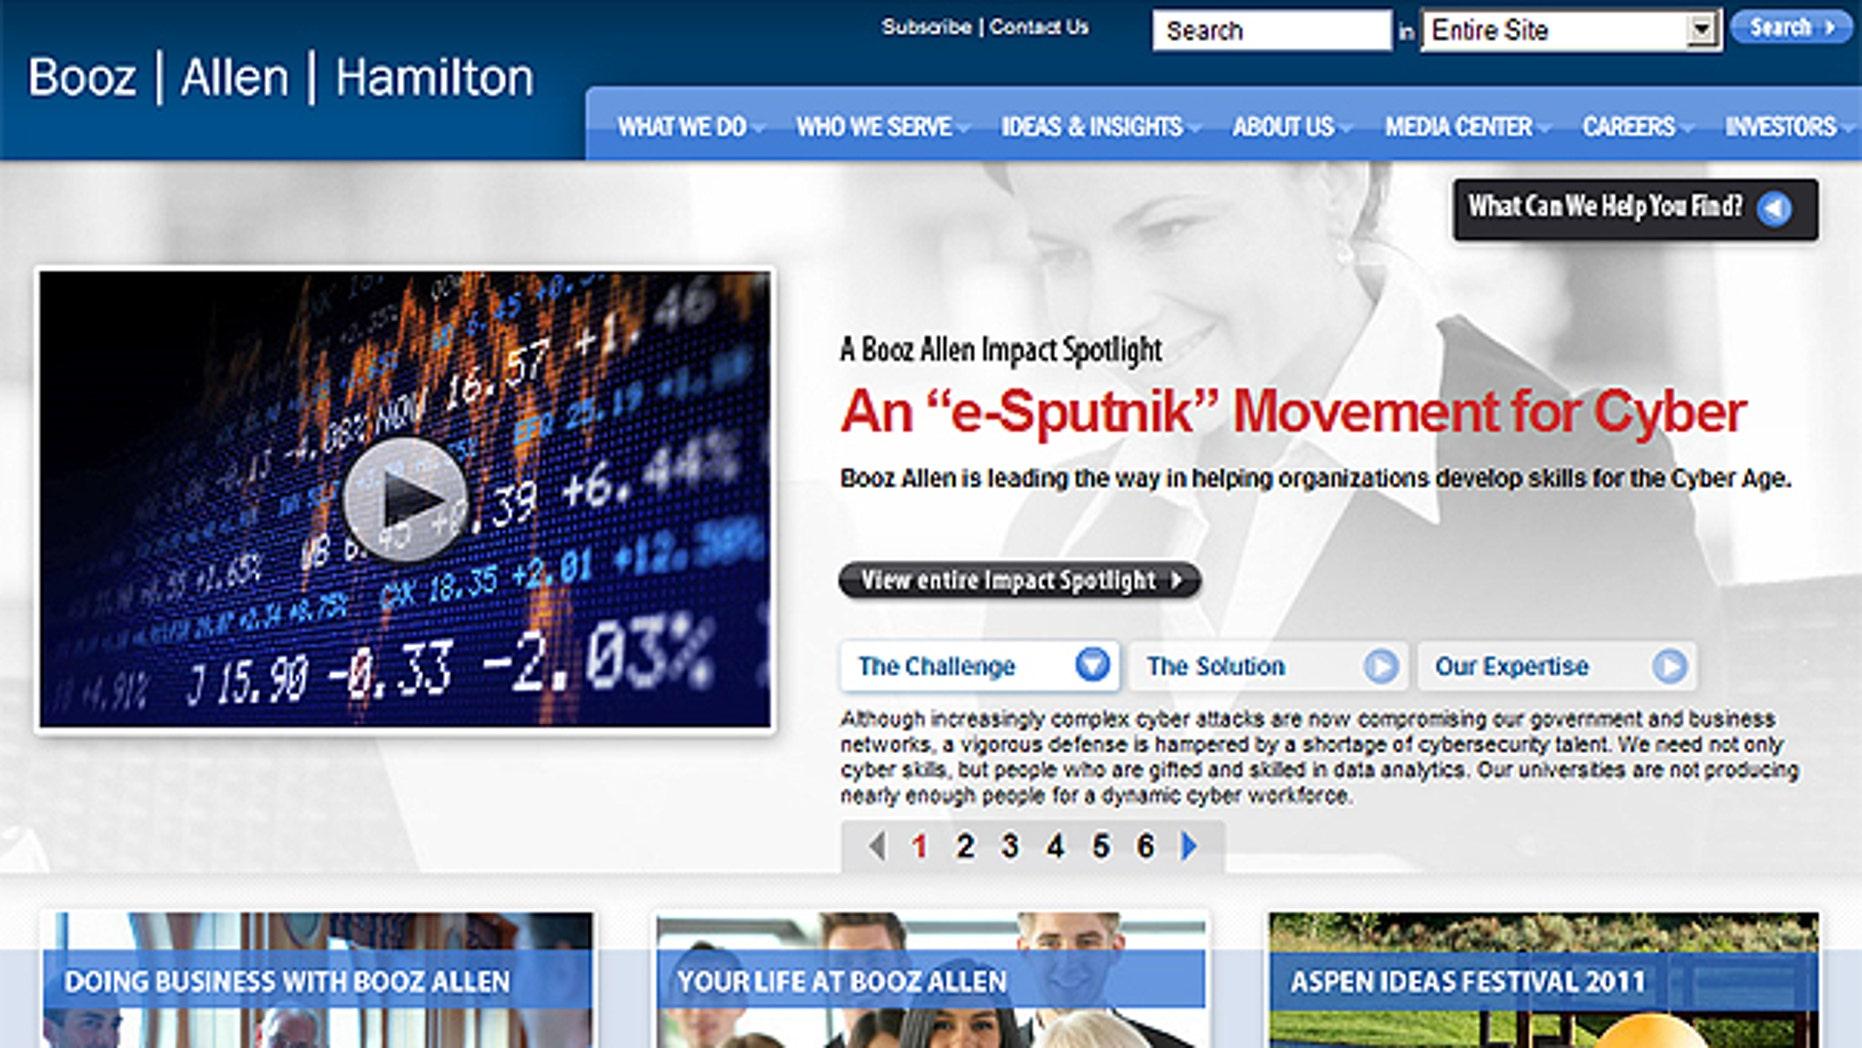 This screengrab shows the homepage of Booz Allen Hamilton Inc.